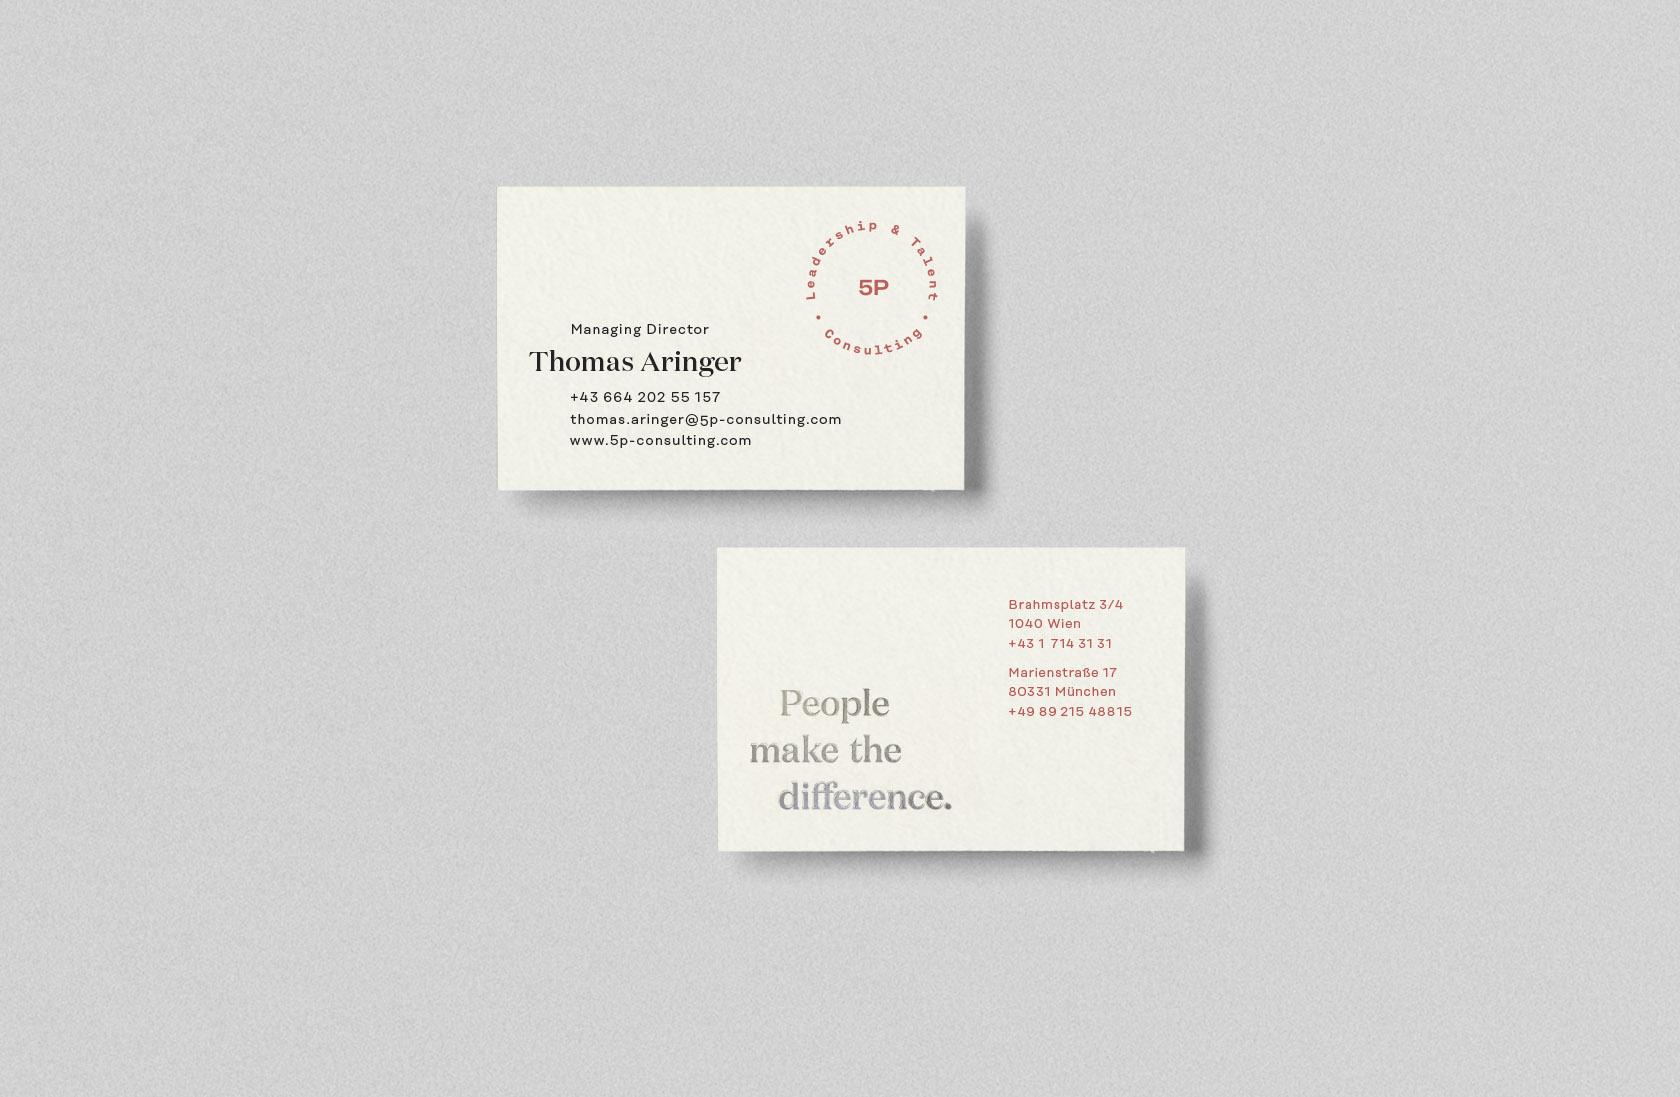 5P_businesscard_2